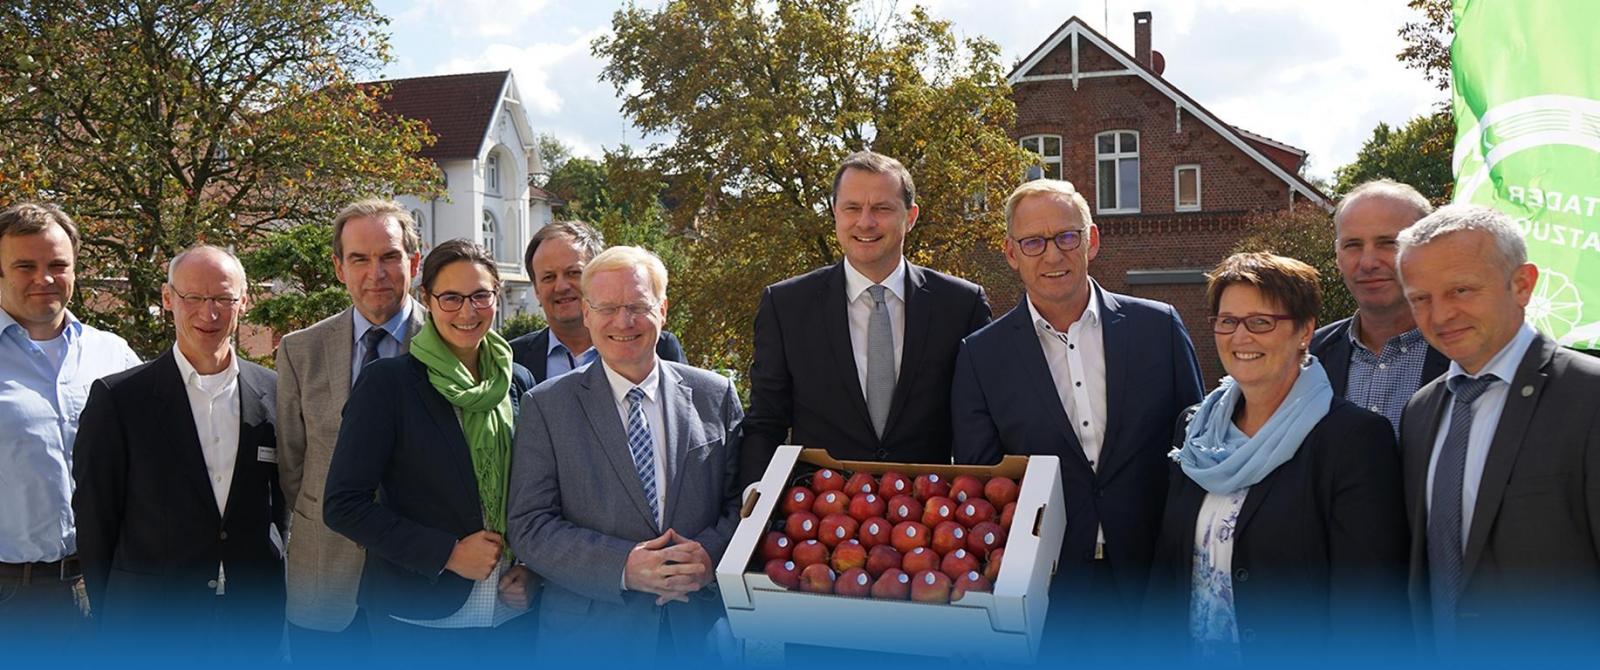 20-oliver-grundmann-bundestag-stade-rotenburg-bundestagsabgeordneter-bundestag